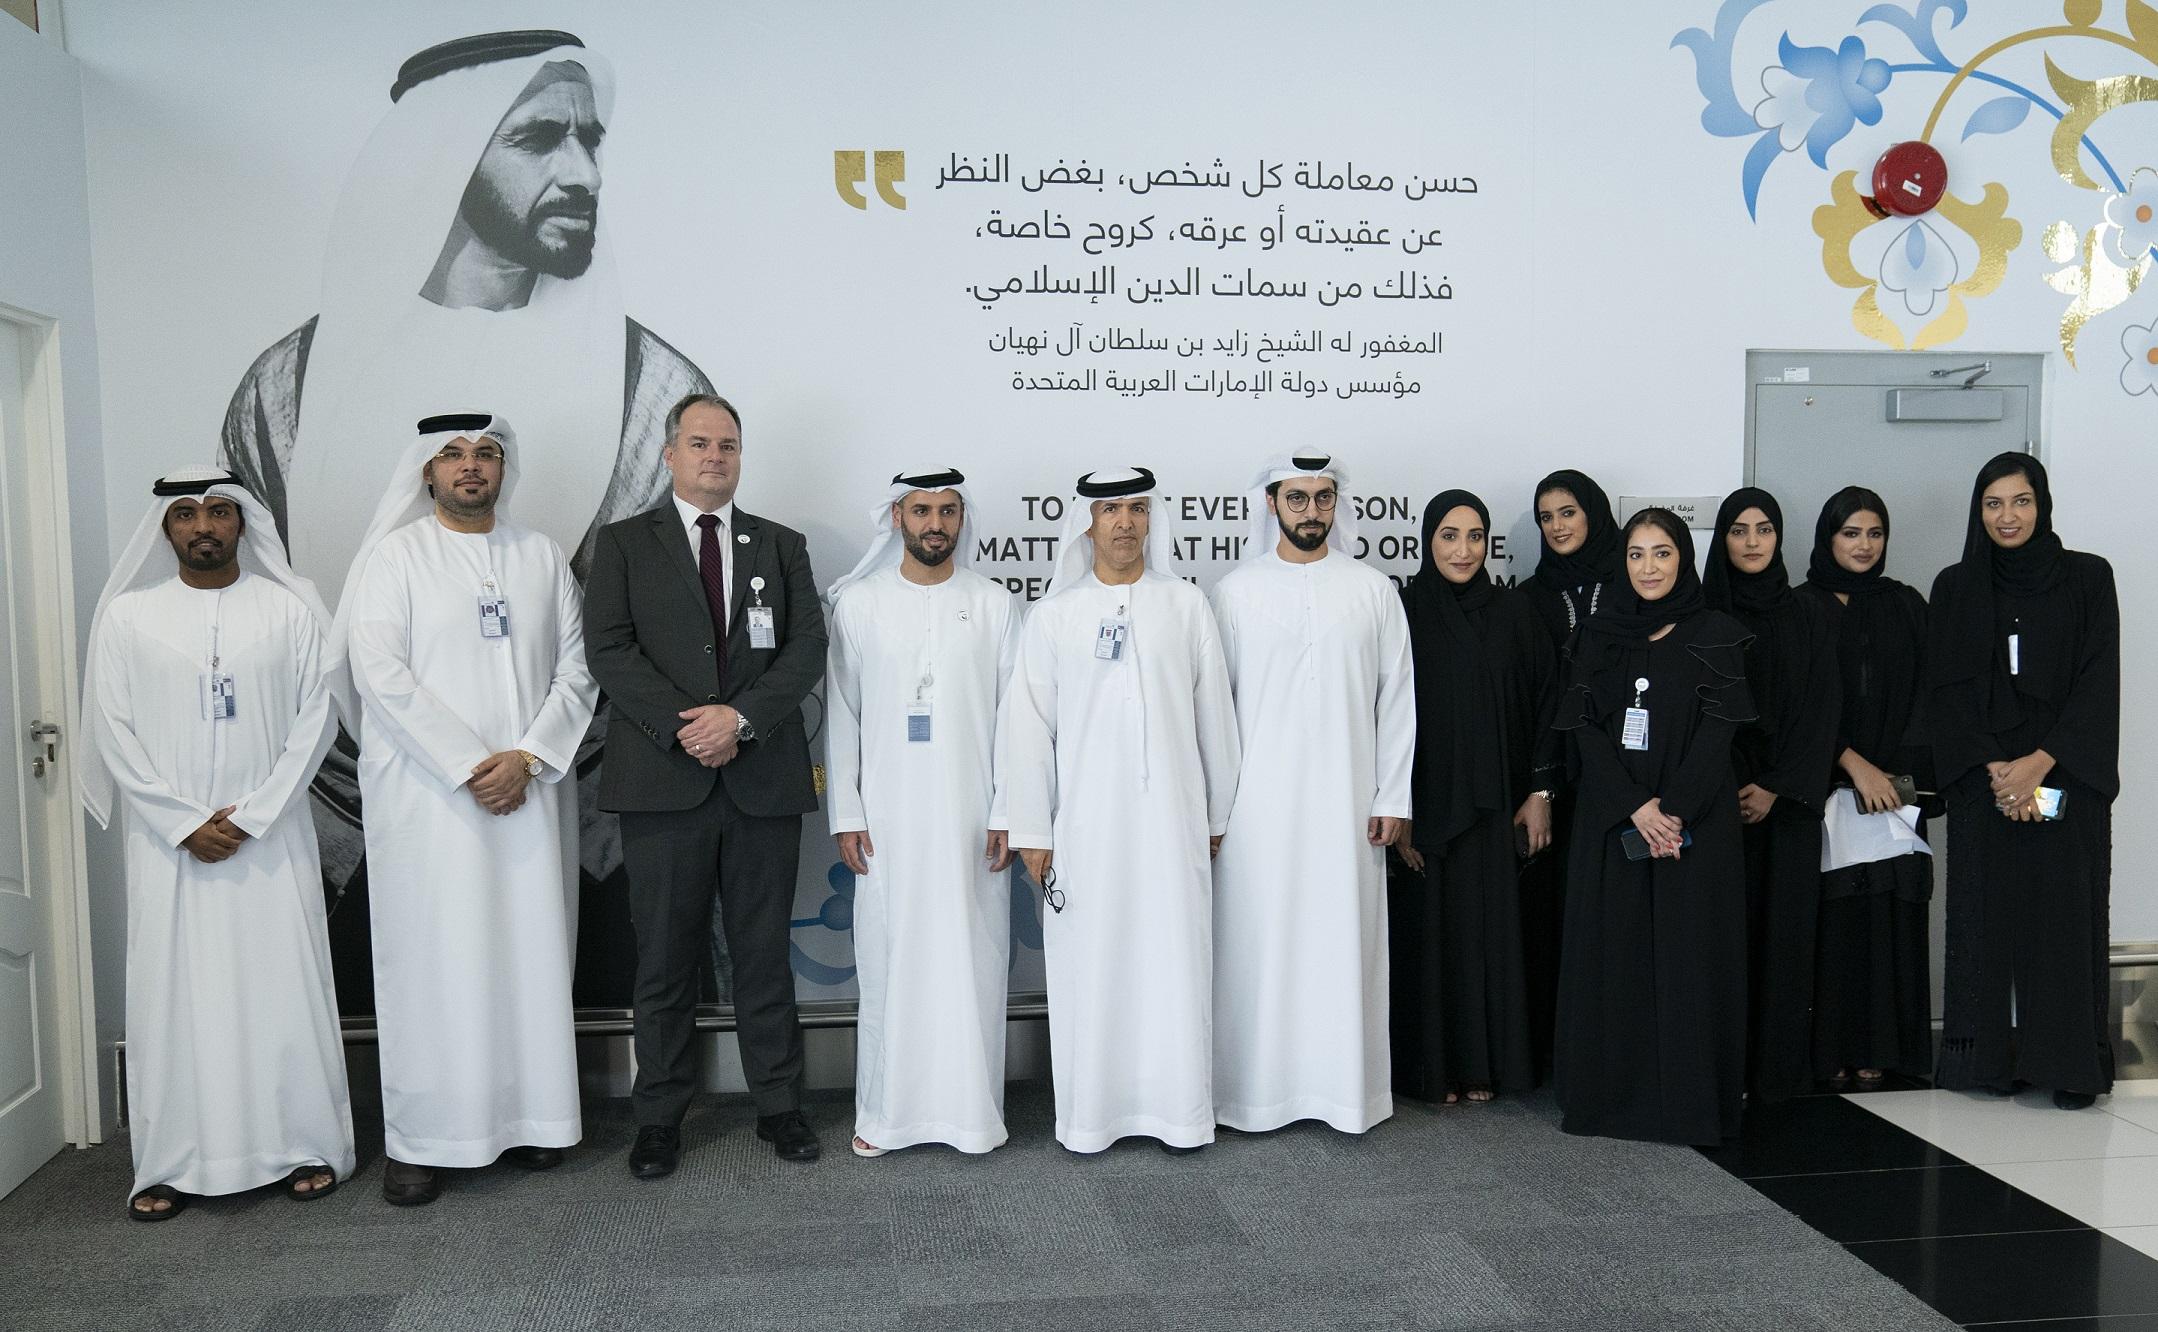 abu dhabi international airport officially opens multi-faith prayer room 1